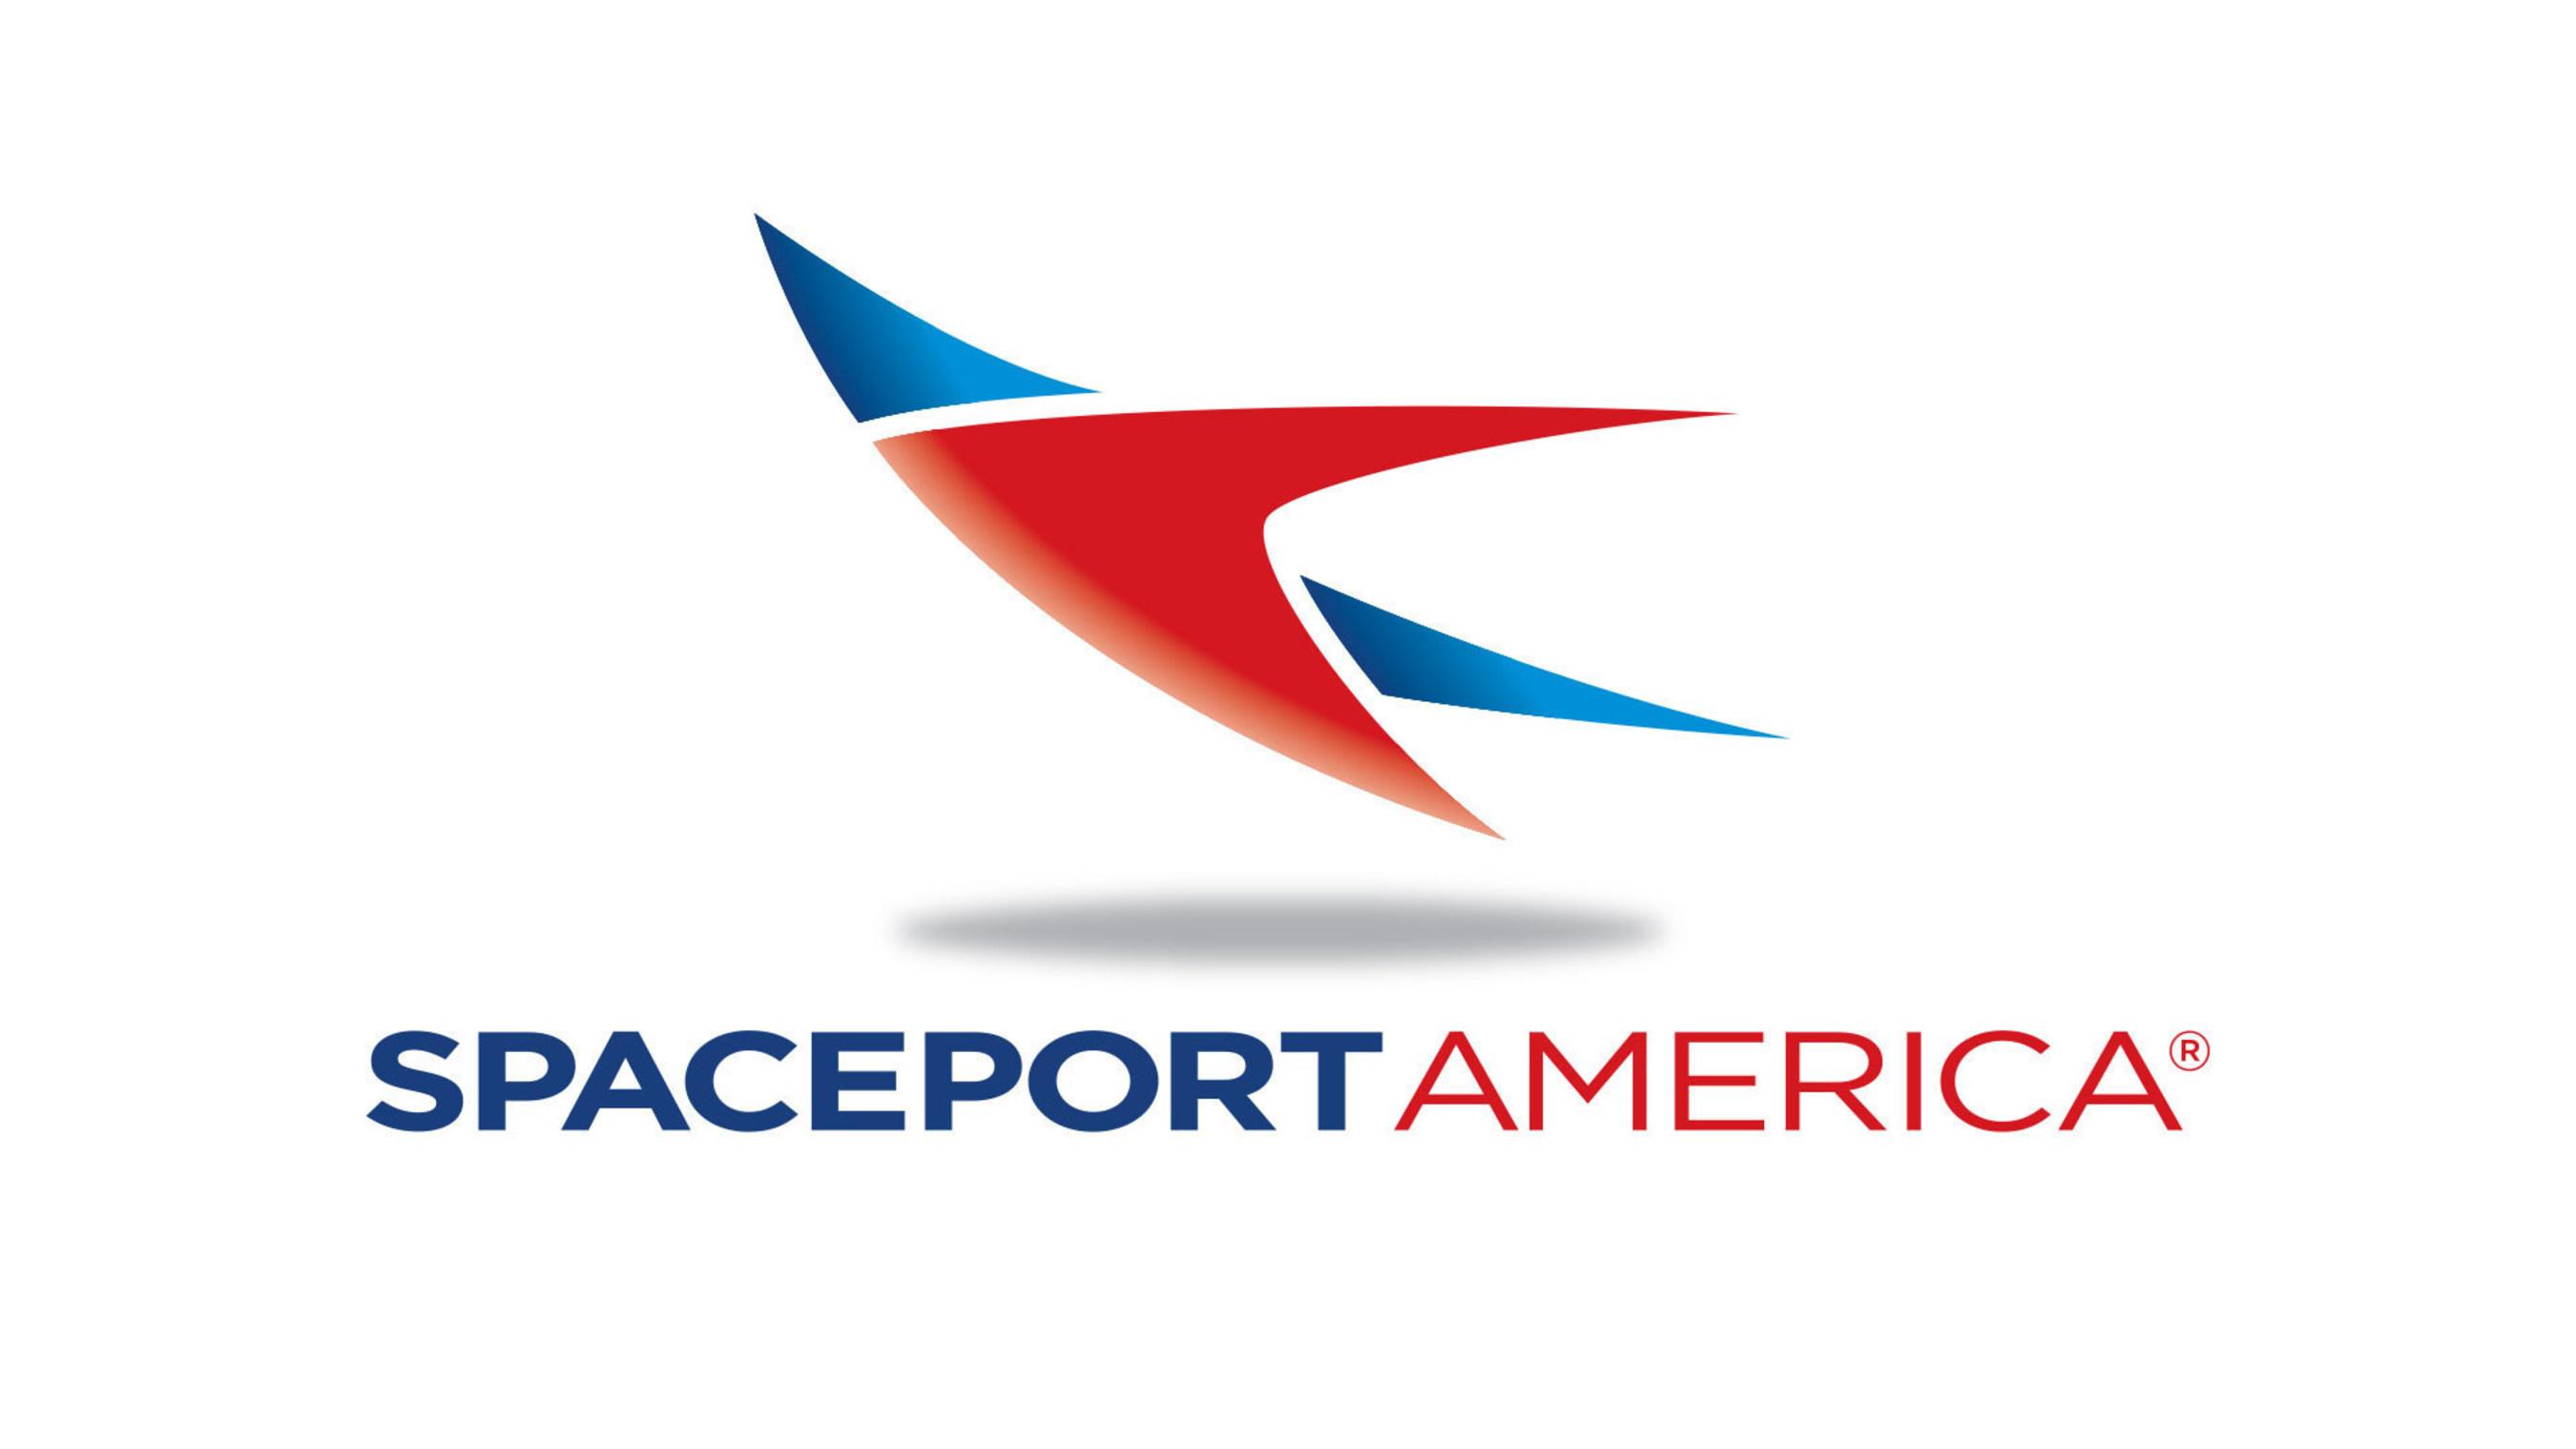 Spaceport America logotype (PRNewsFoto/Spaceport America)